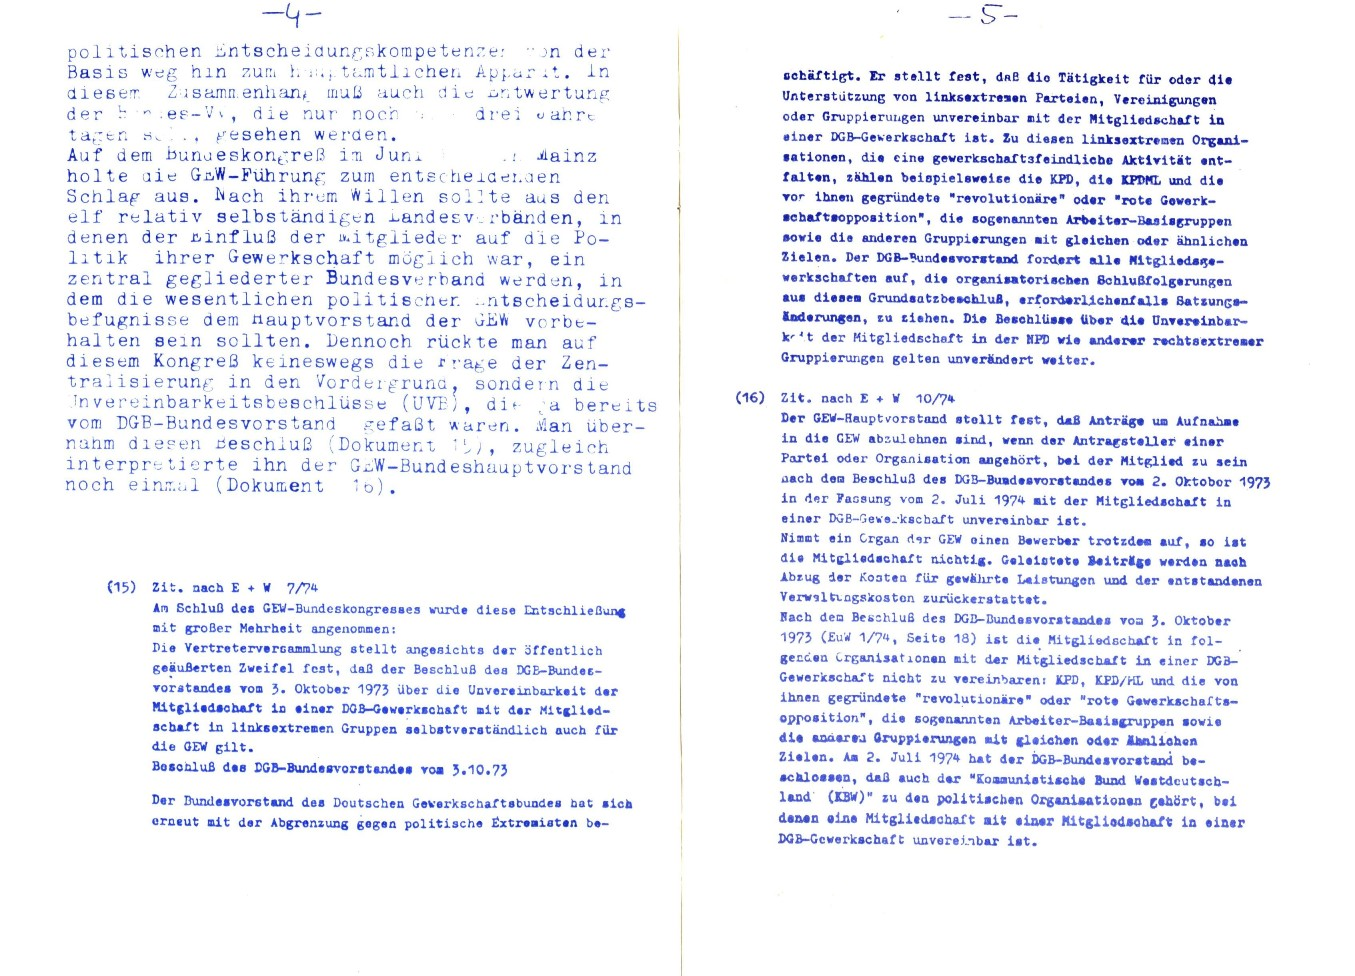 Berlin_GIM_1976_Zum_Fall_GEW_04